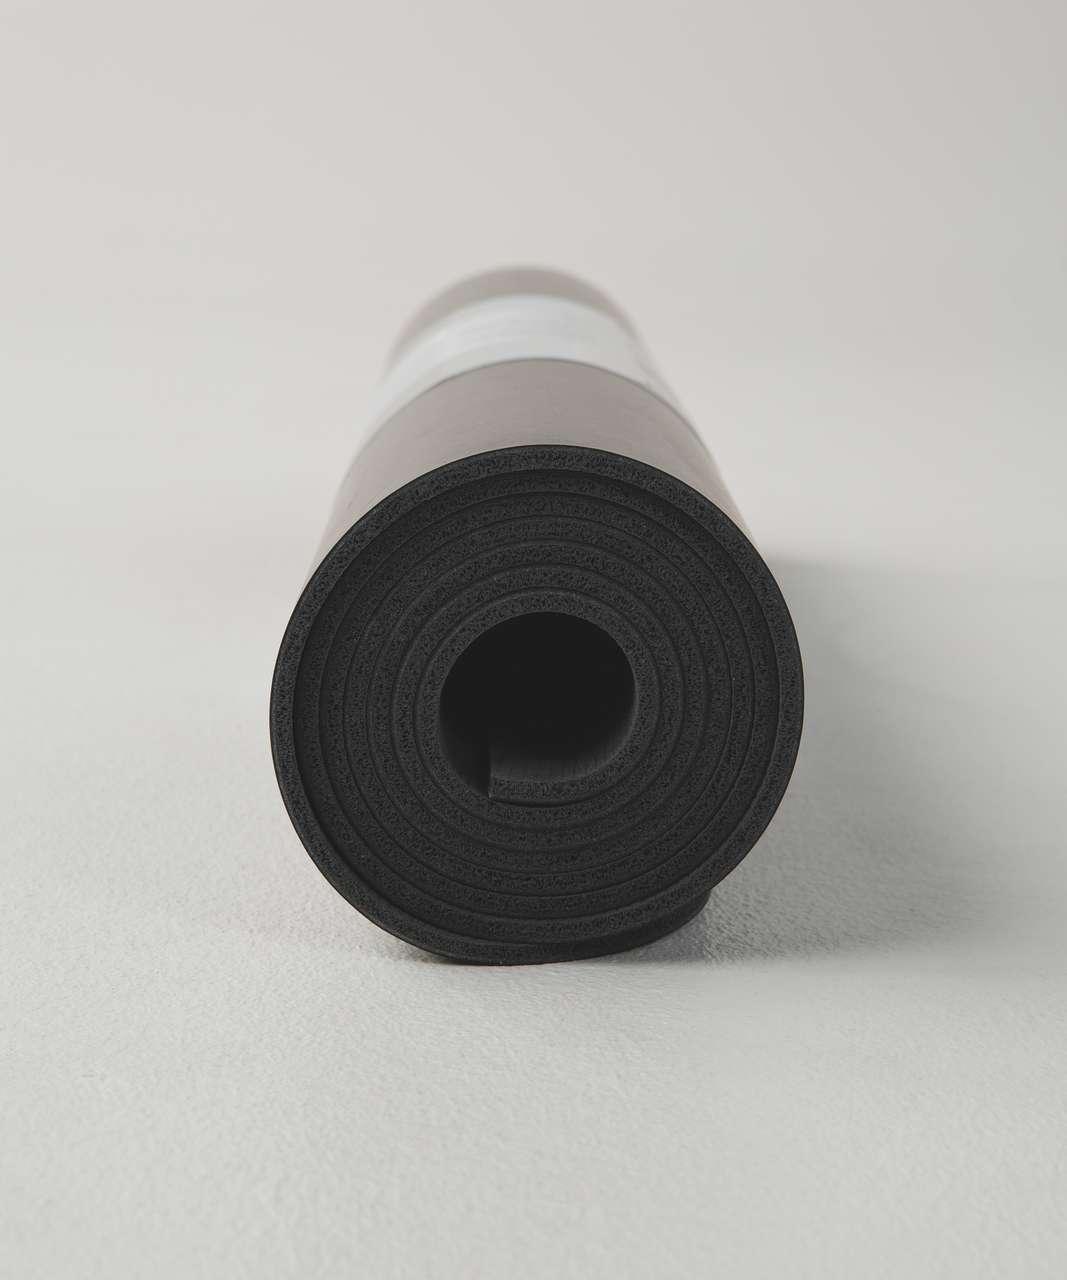 Lululemon The Reversible Mat 5mm (This Is Yoga) - Black